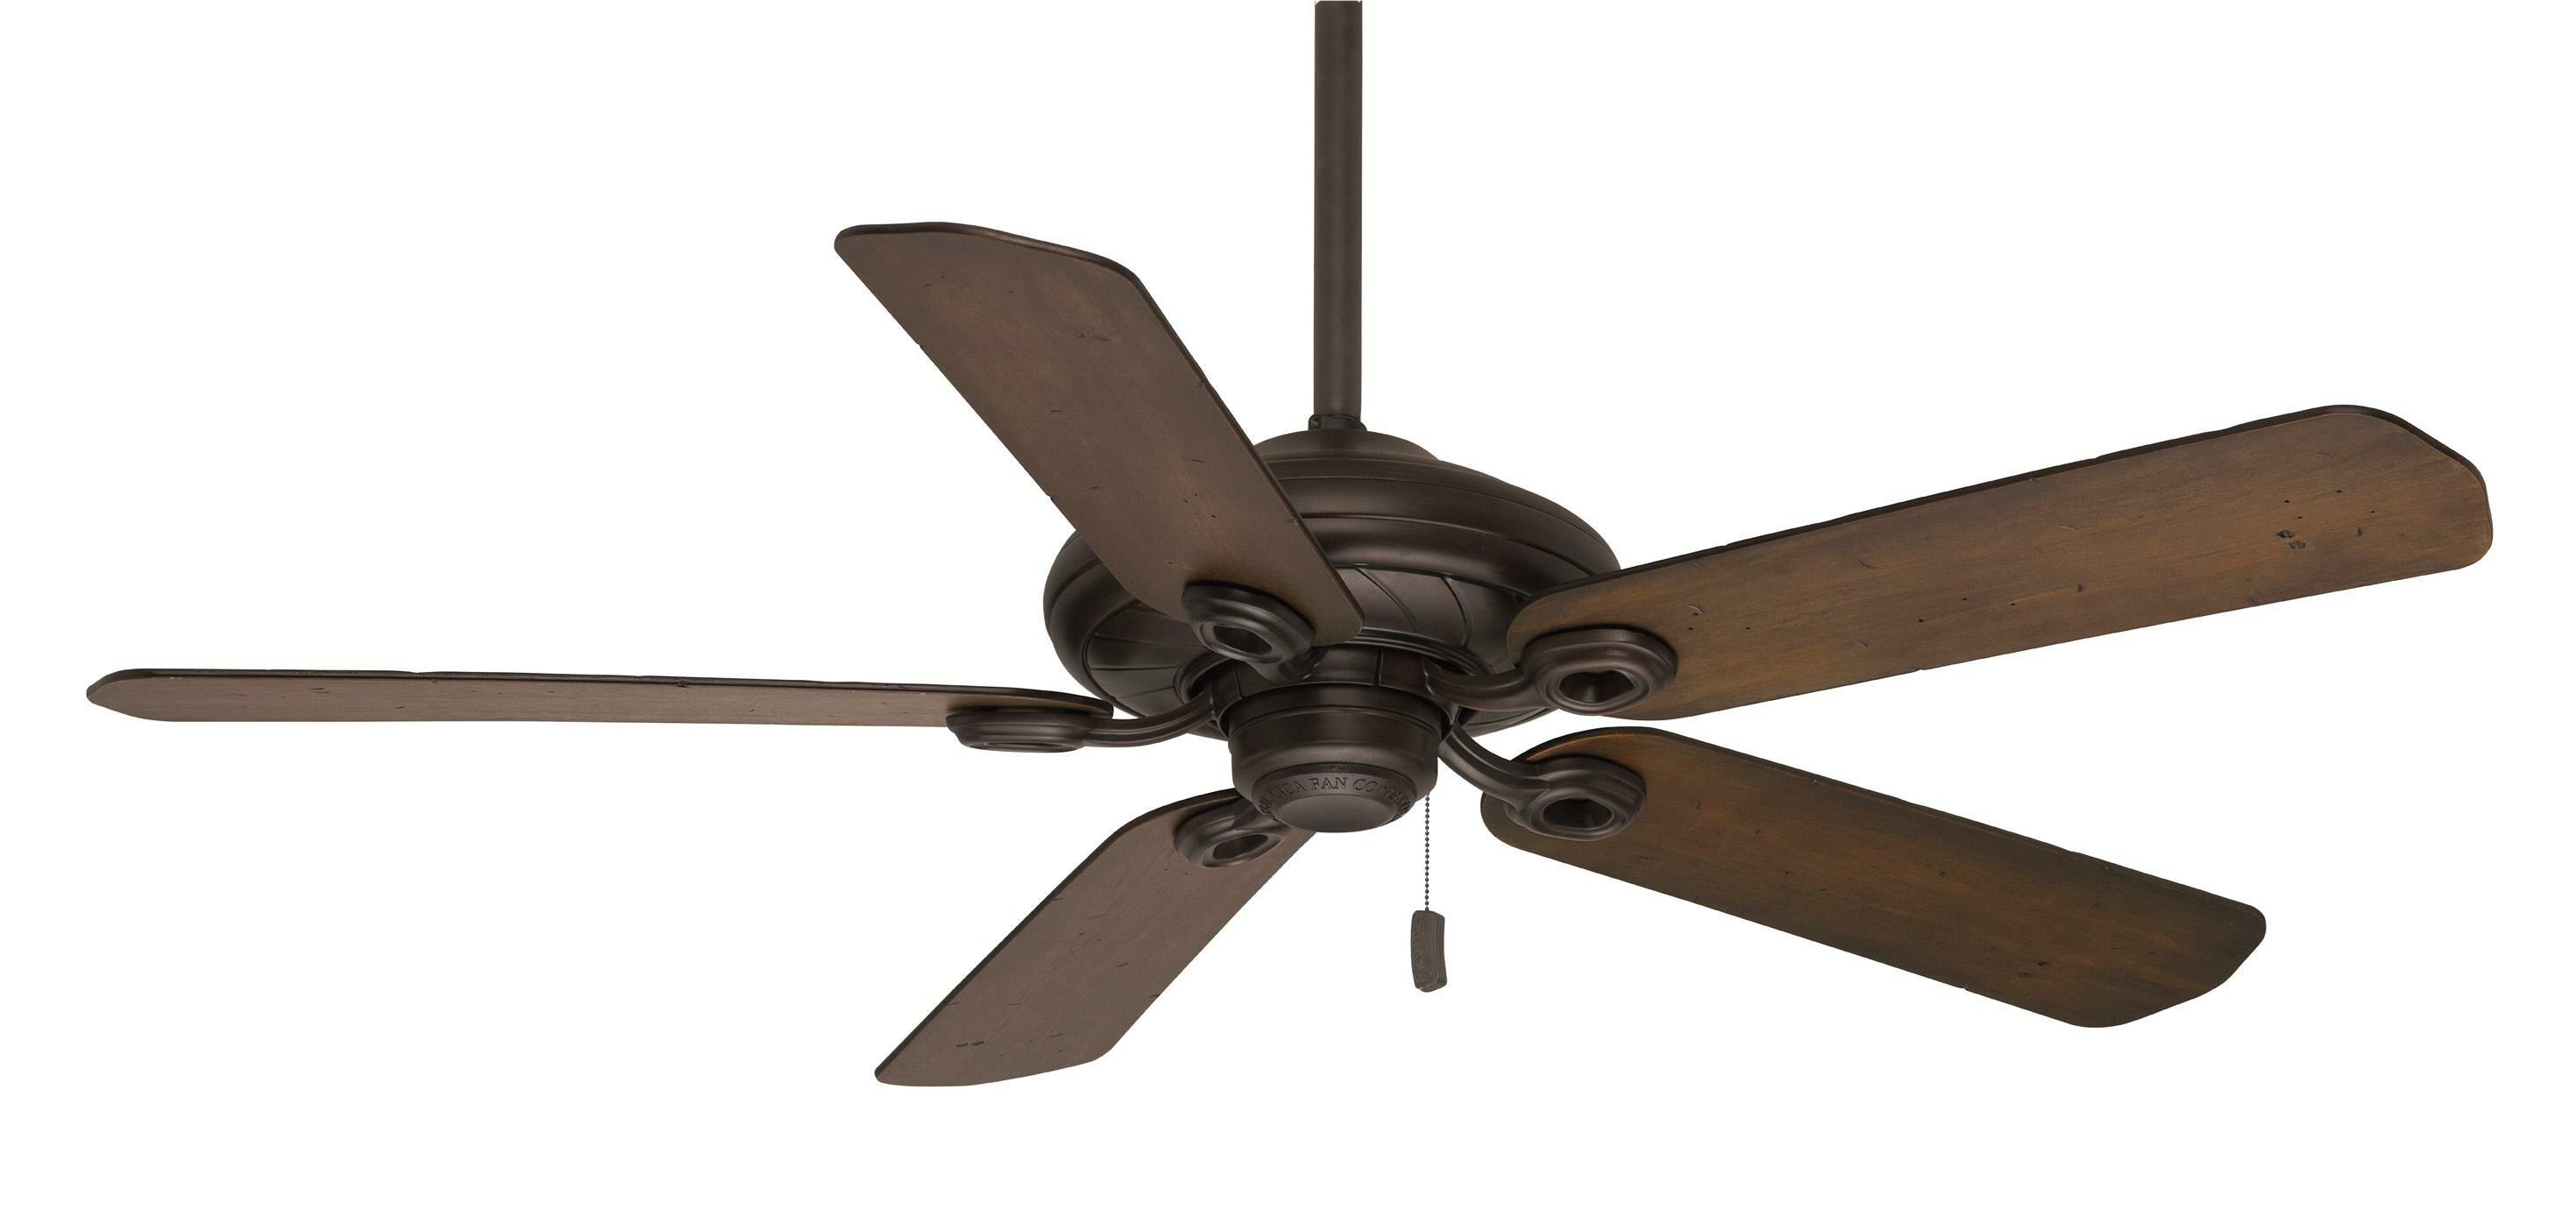 "Casablanca Fan 54"" Capistrano 5 Blades Outdoor Damp Ceiling Fan"